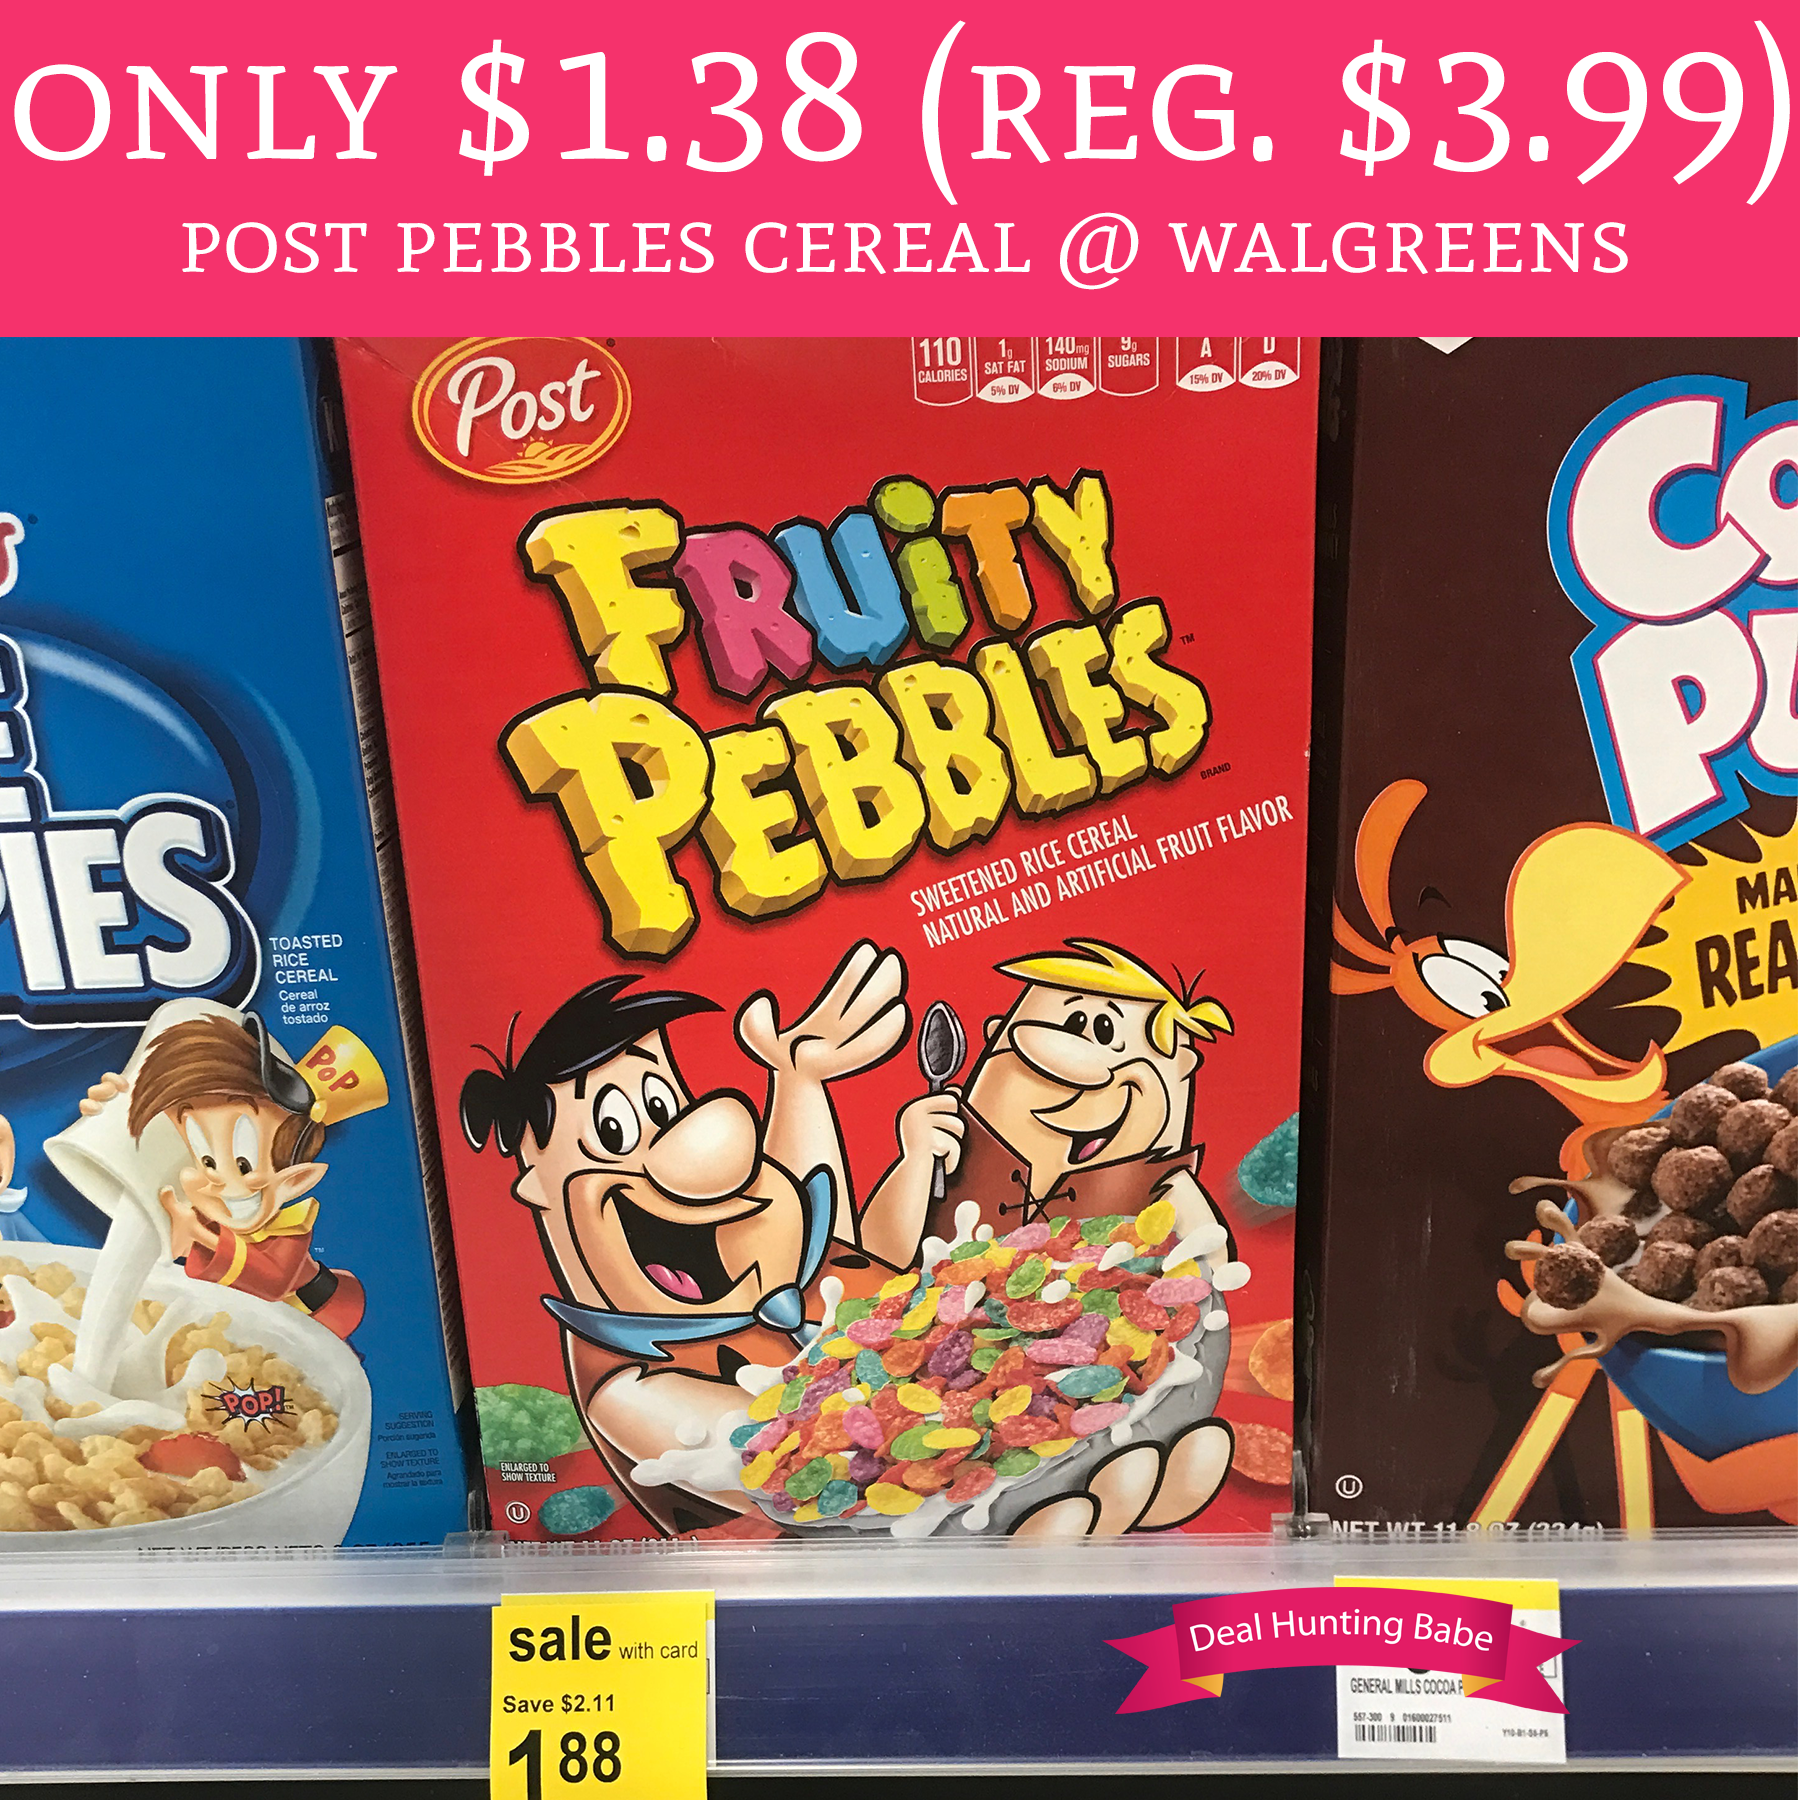 Only $1.38 (Regular $3.99) Post Pebbles Cereal @ Walgreens